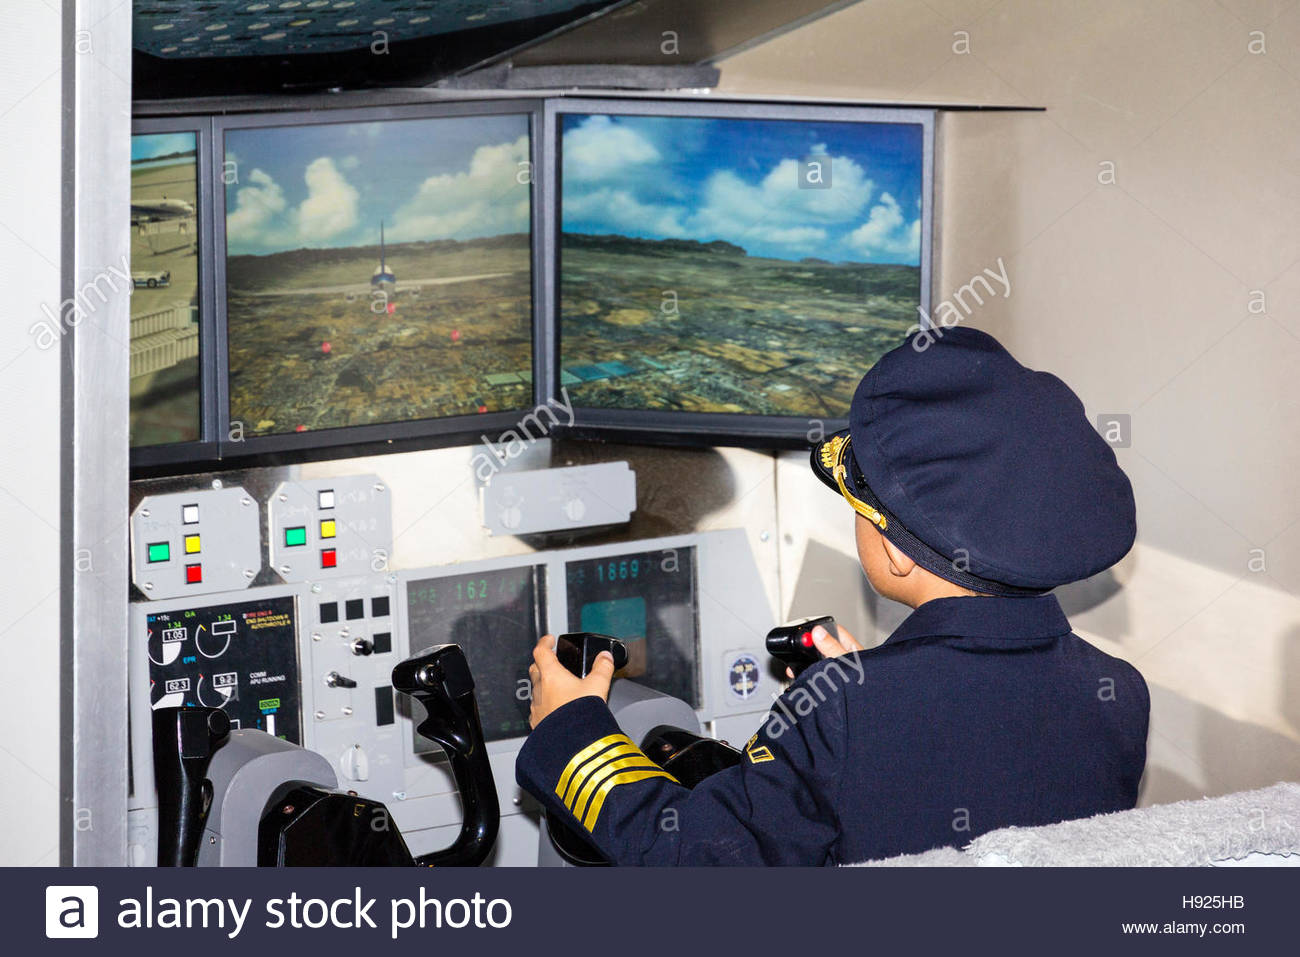 Click image for larger version.  Name:japan-nishinomiya-kidzania-ana-flight-simulators-with-boy-child-in-H925HB.jpg Views:34 Size:151.8 KB ID:25492